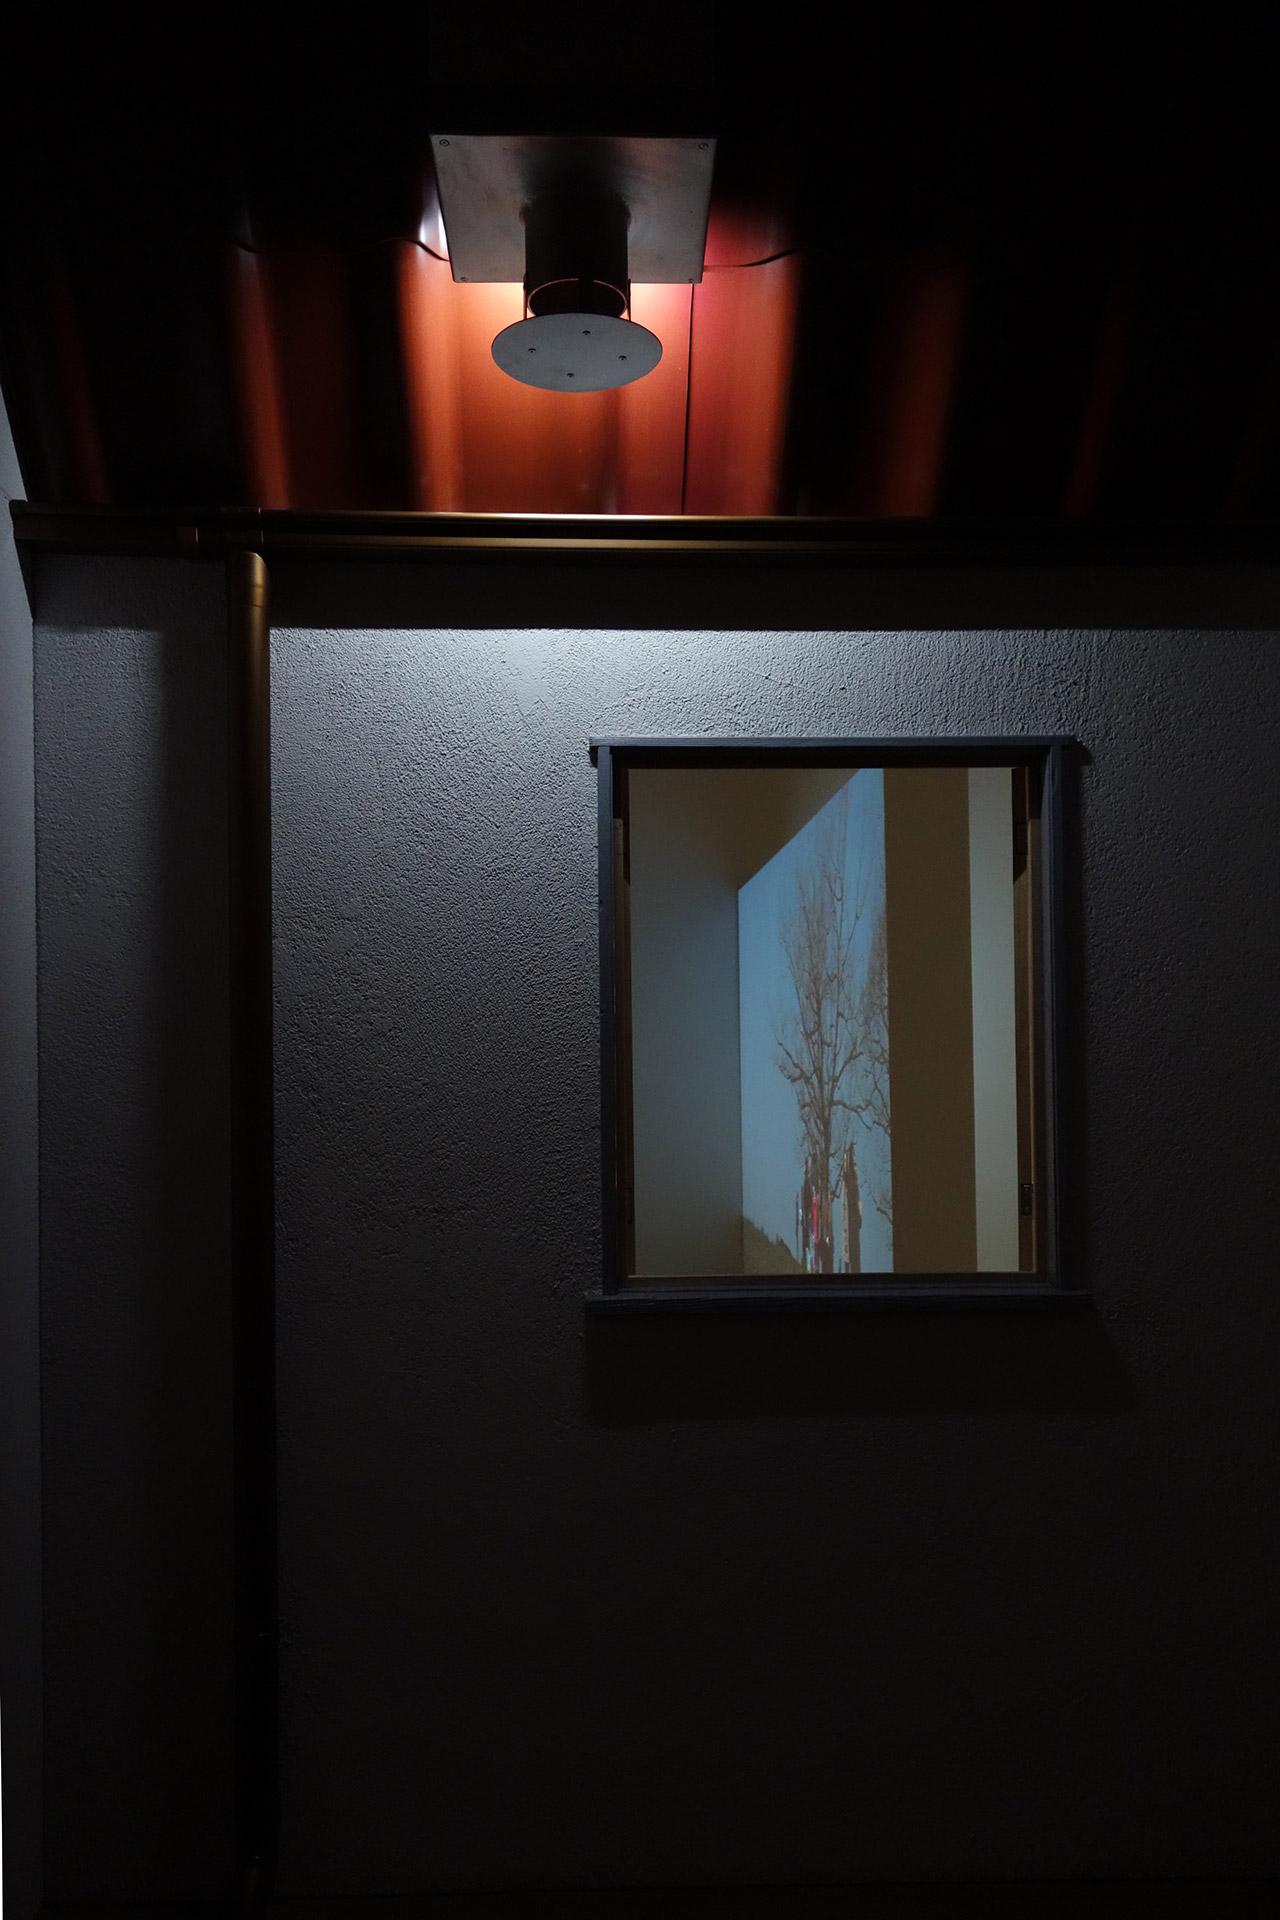 Kunsthalle-Winterthur-Dezember-Ausstellung-2017-3.jpg